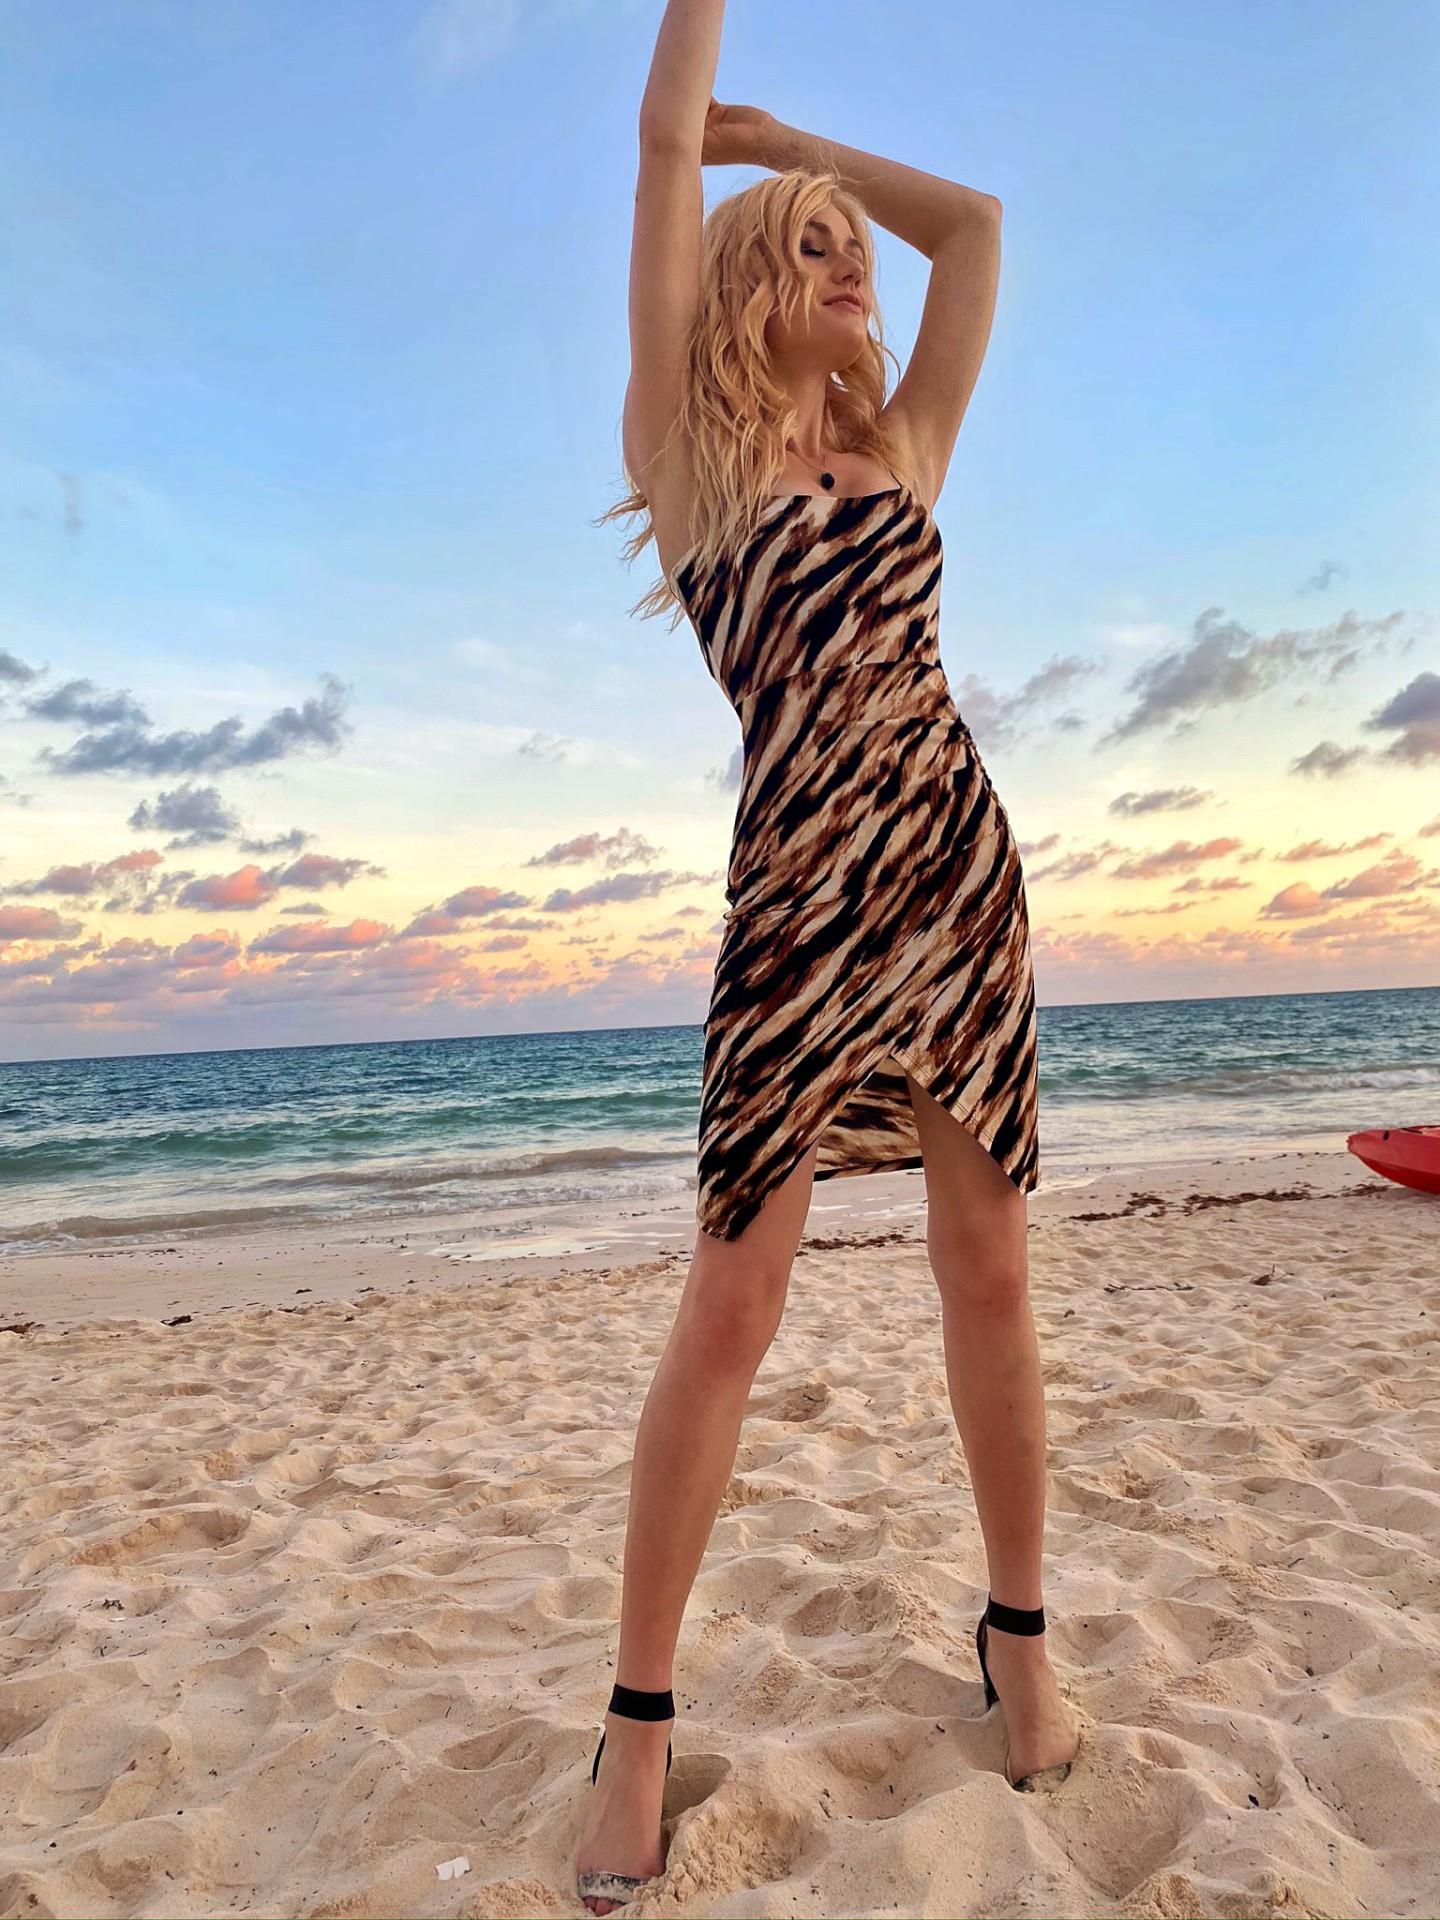 Katherine Mcnamara Sexy On Beach